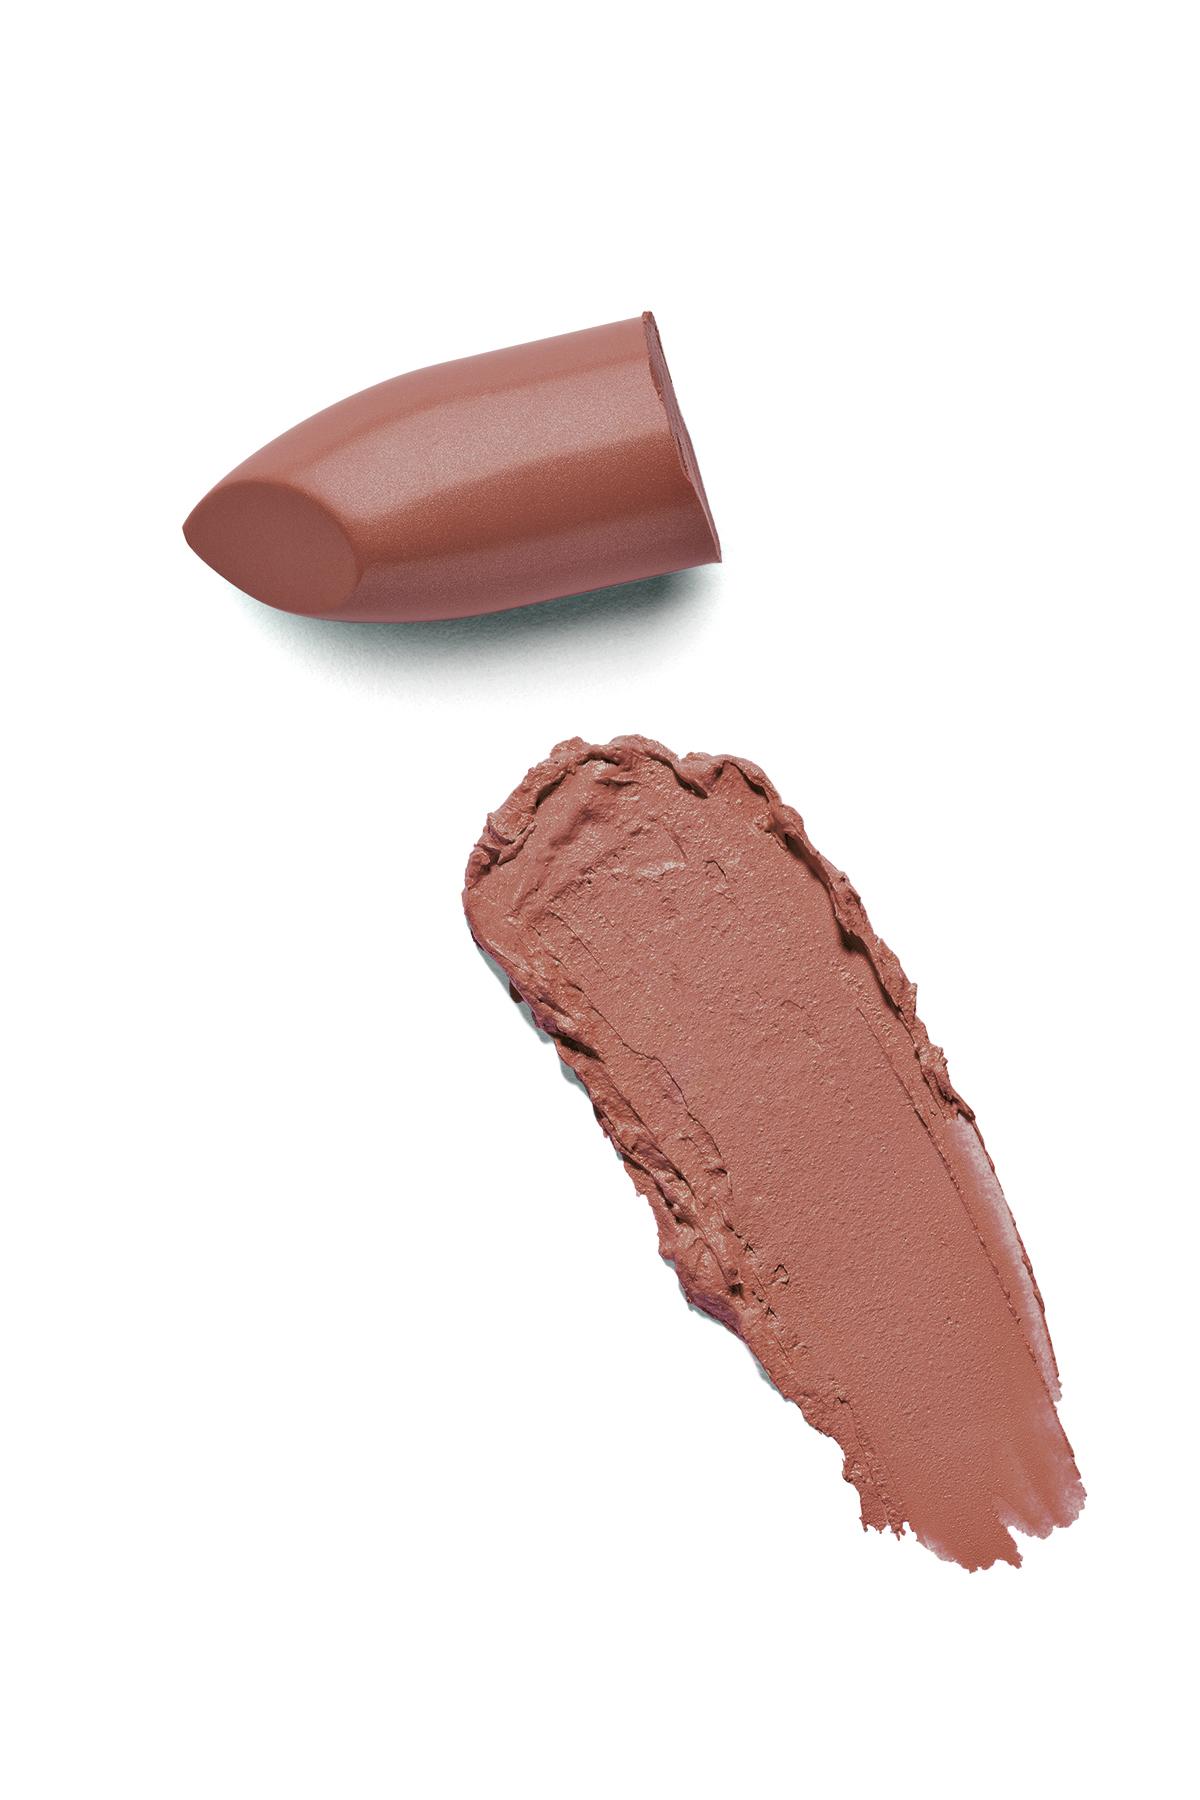 Matte Lipstick - 173 -Lipstick Thumbnail